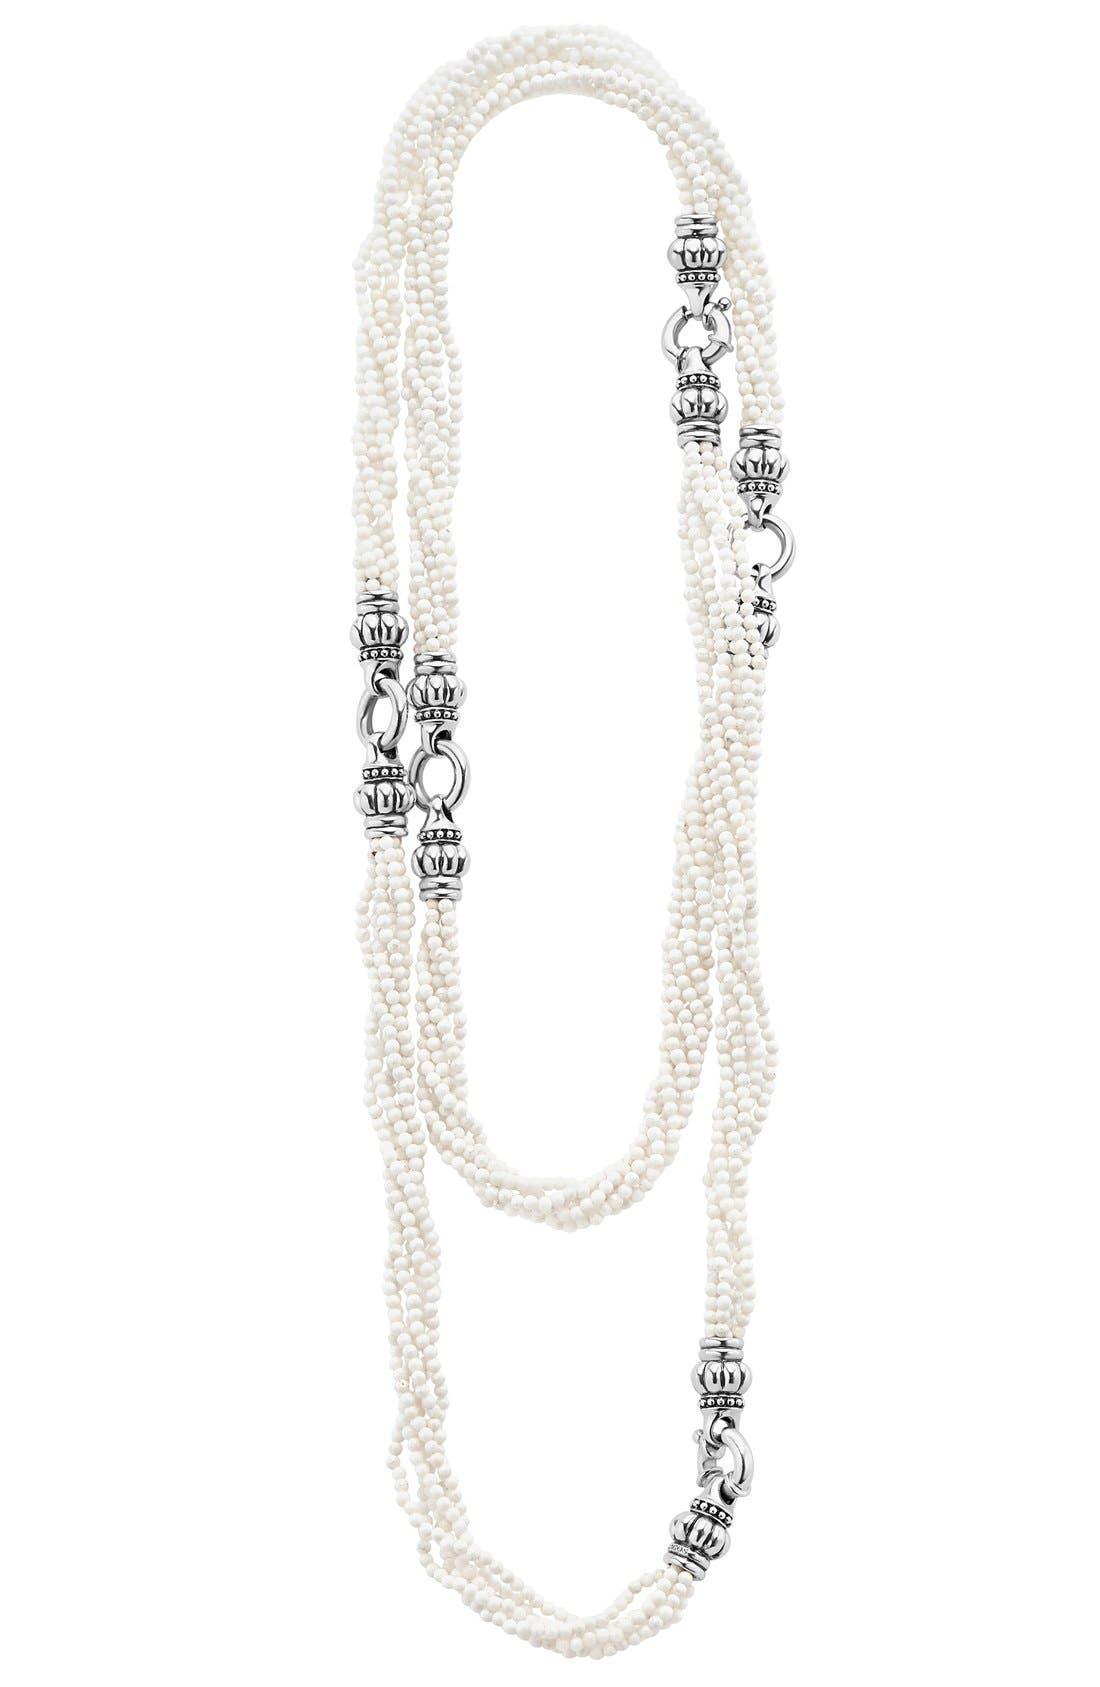 'Black & White Caviar' Agate Multistrand Necklace,                             Main thumbnail 1, color,                             101